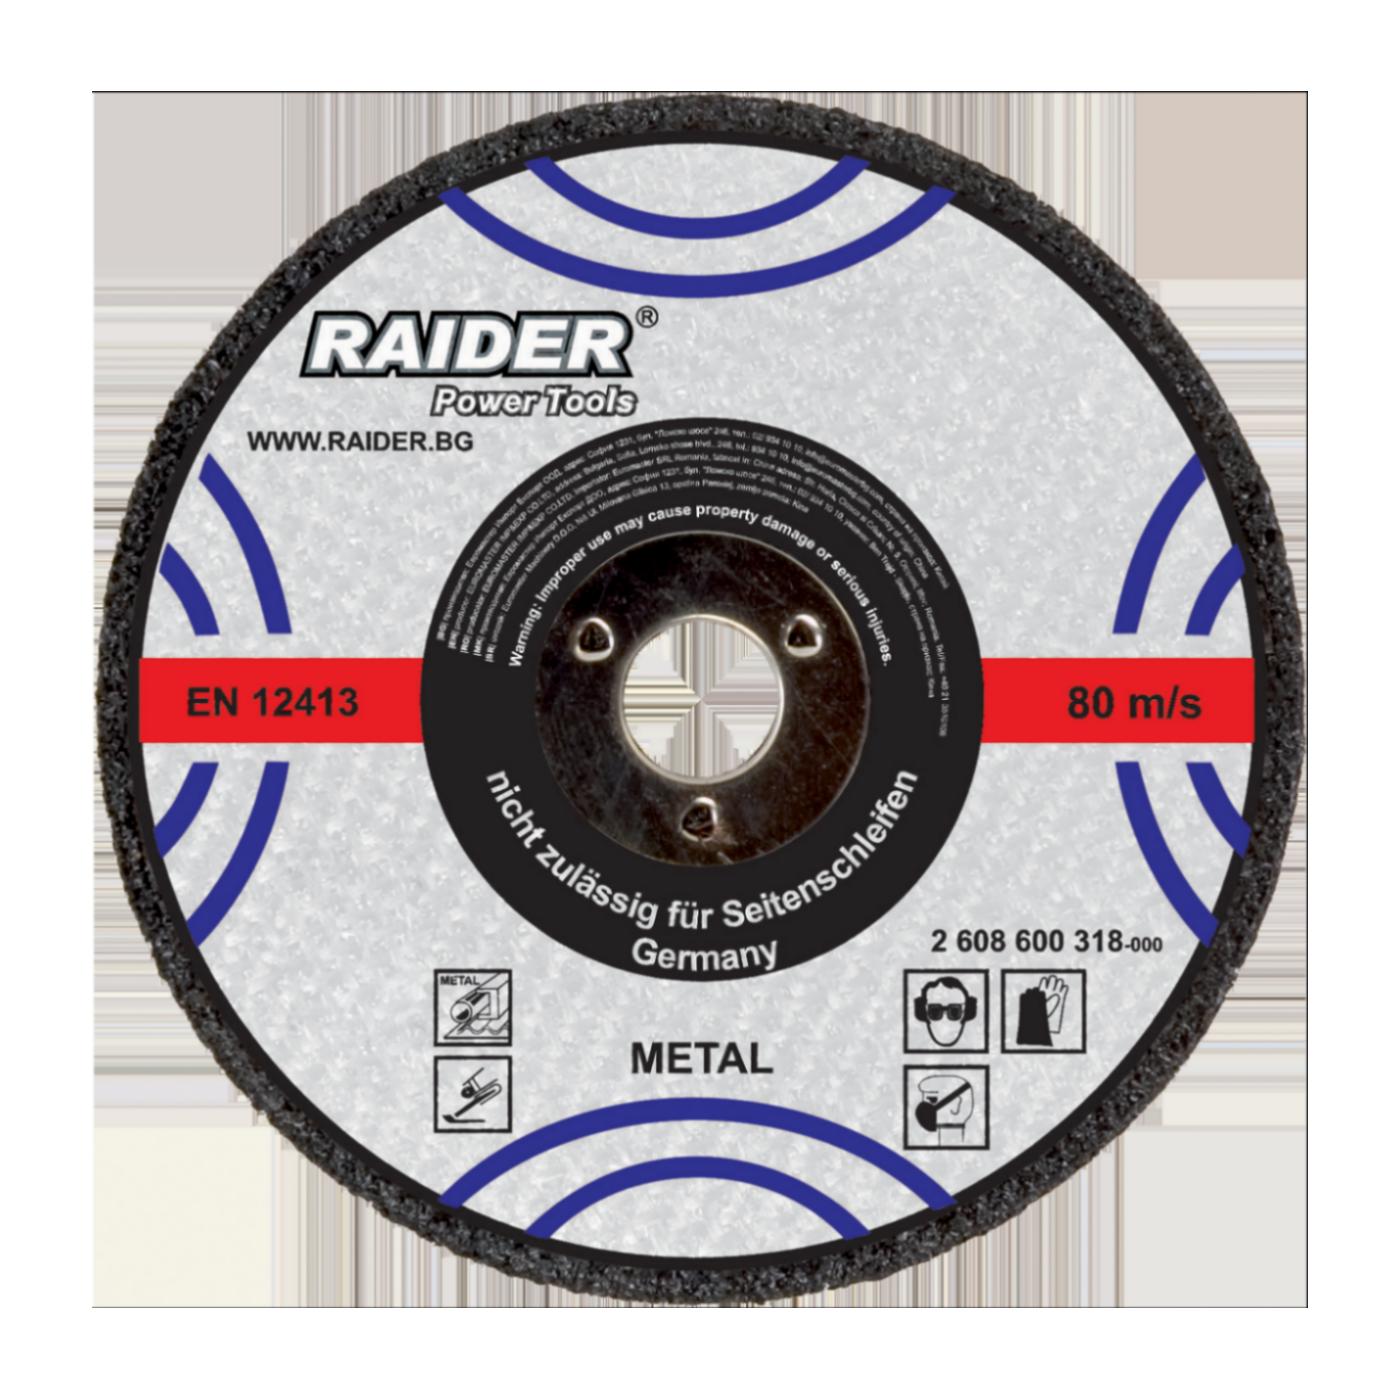 Raider - 160101